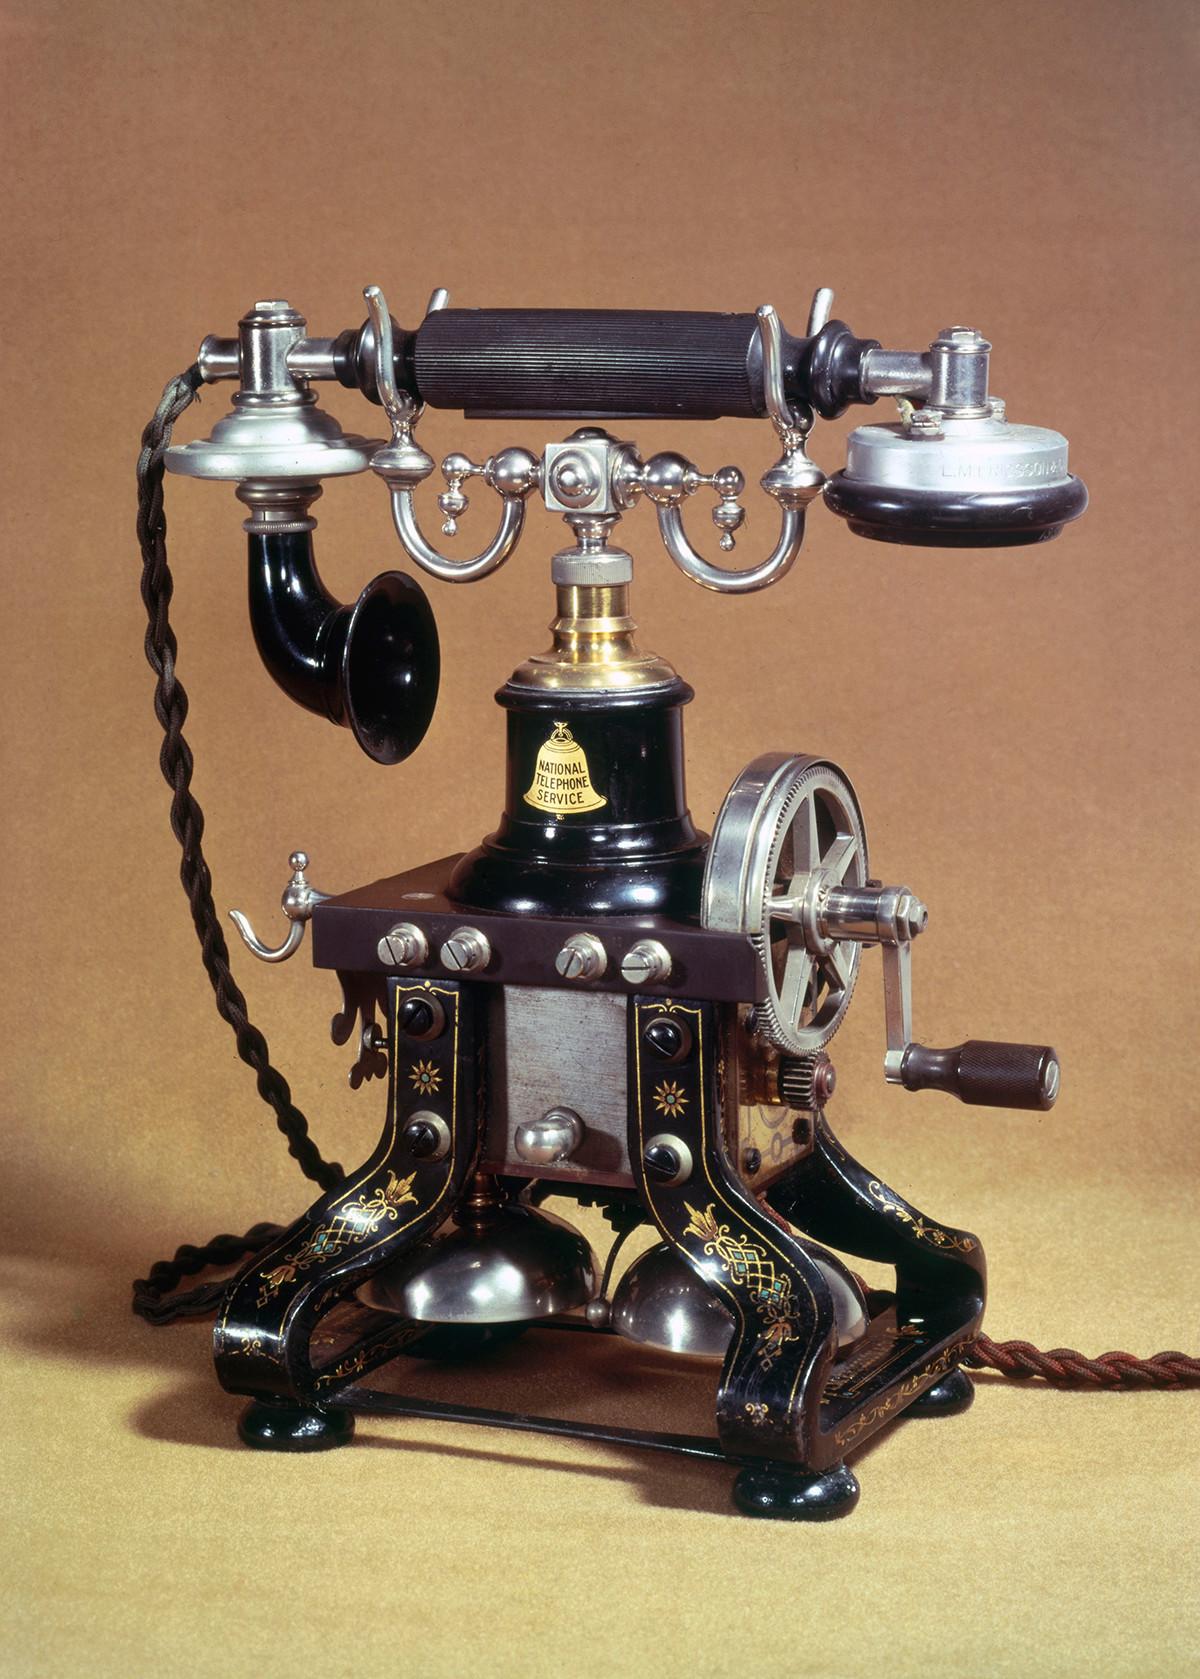 Ericsson table telephone, 1890